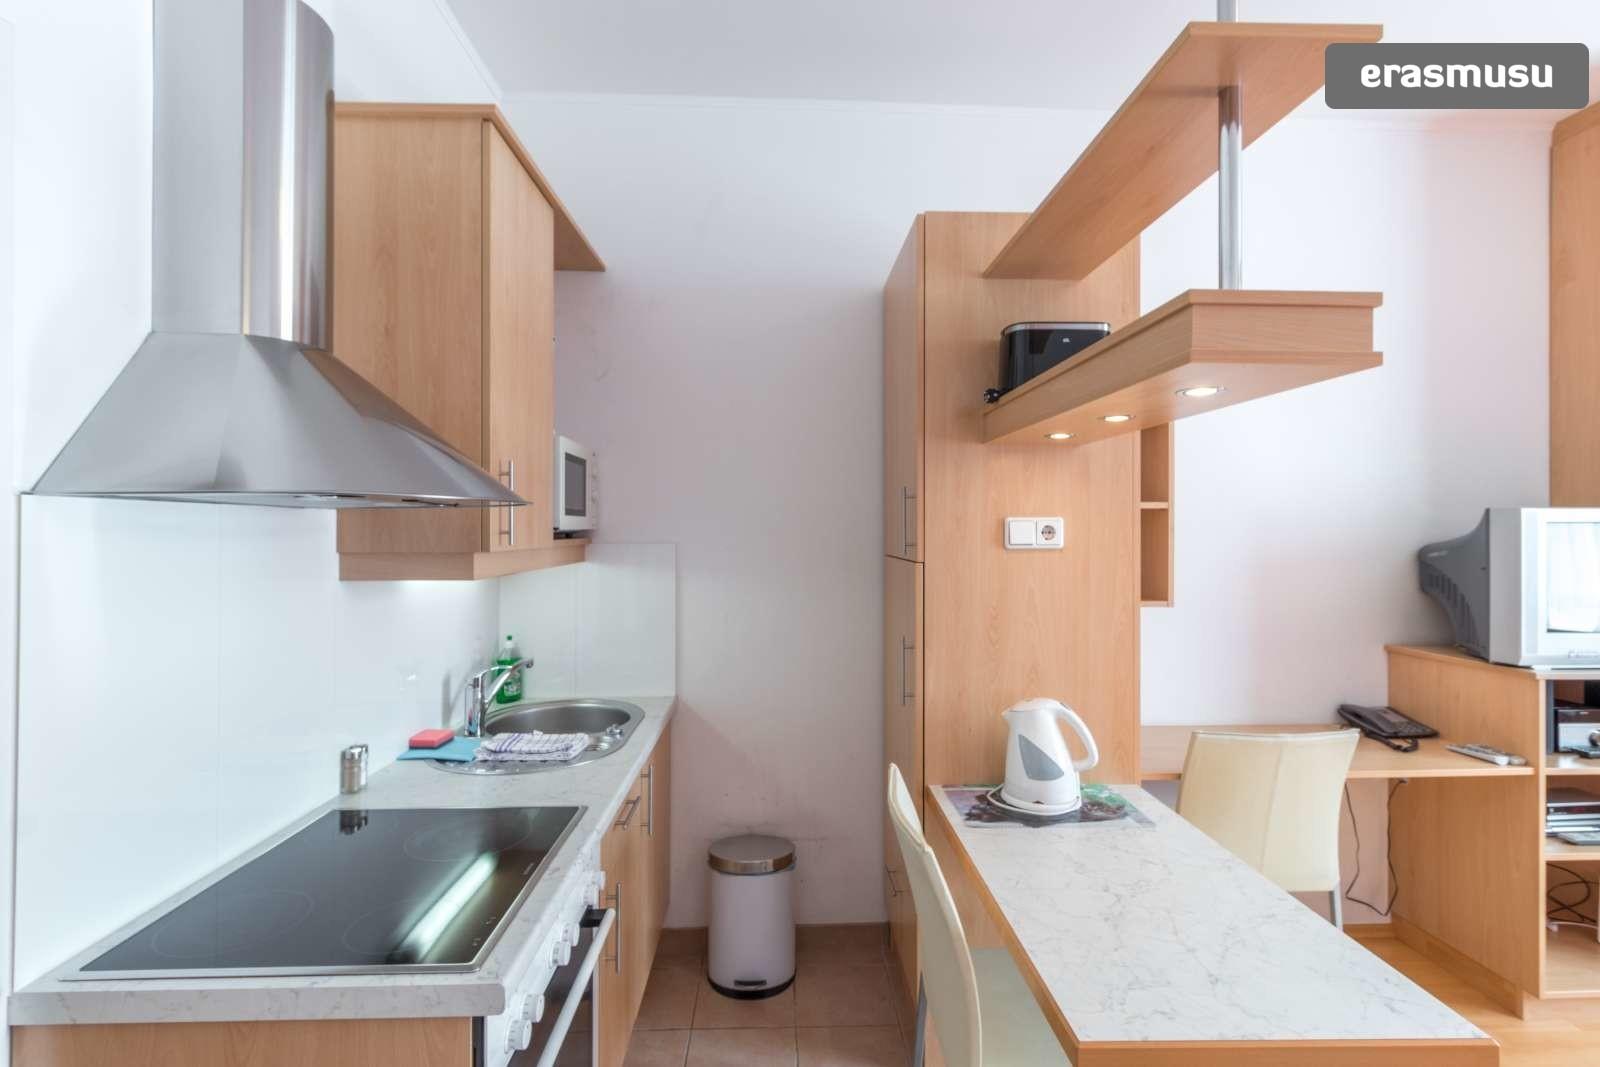 sunny-studio-apartment-rent-near-bohemian-prater-favoriten-42179